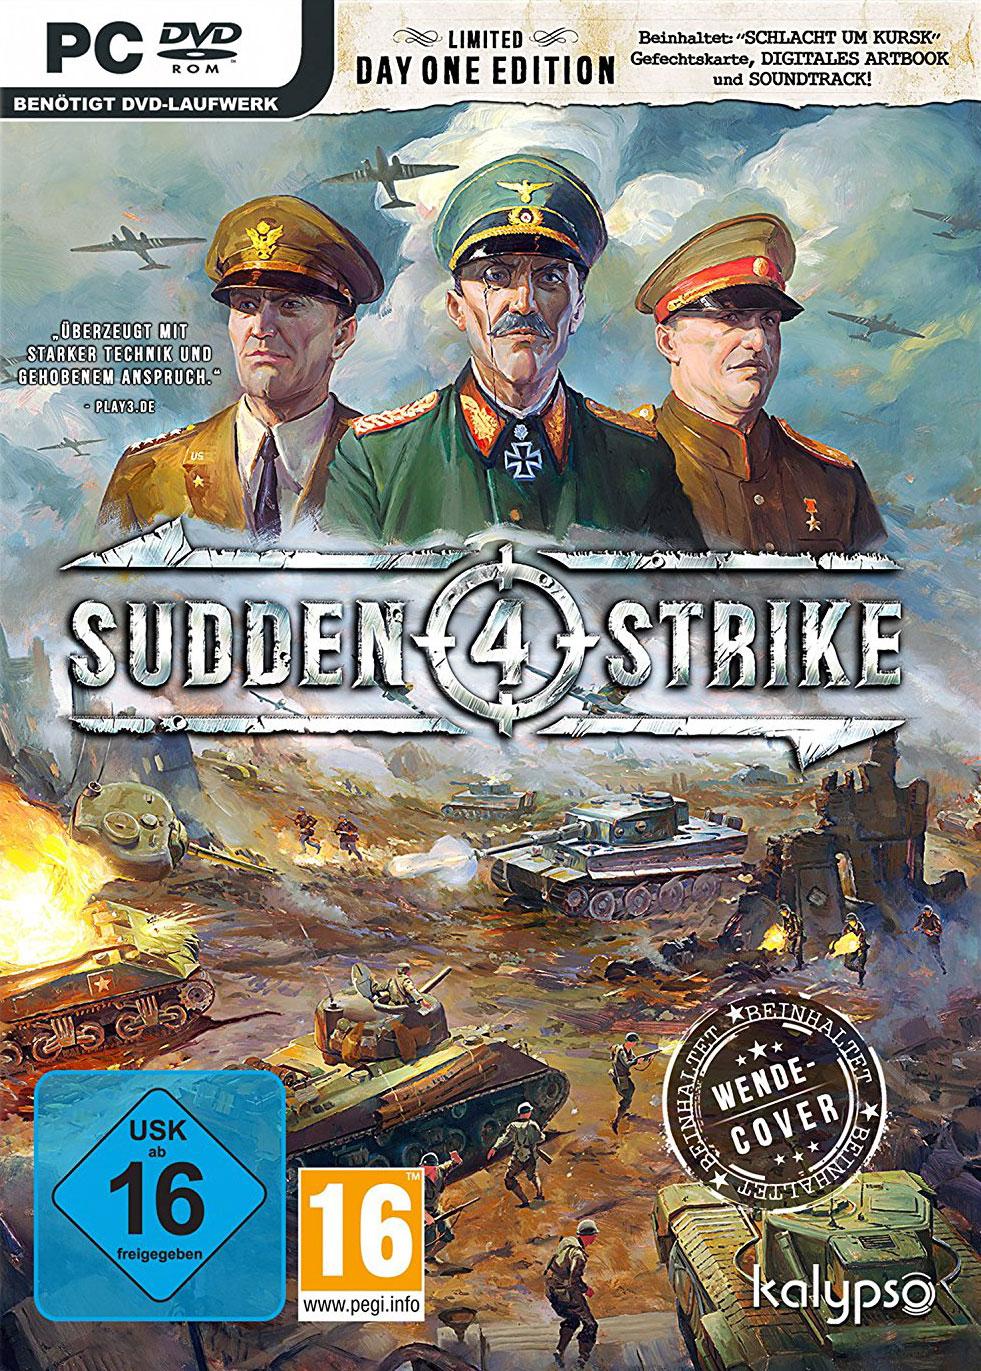 Joc Sudden Strike 4 Limited Day One Edition pentru PC 0